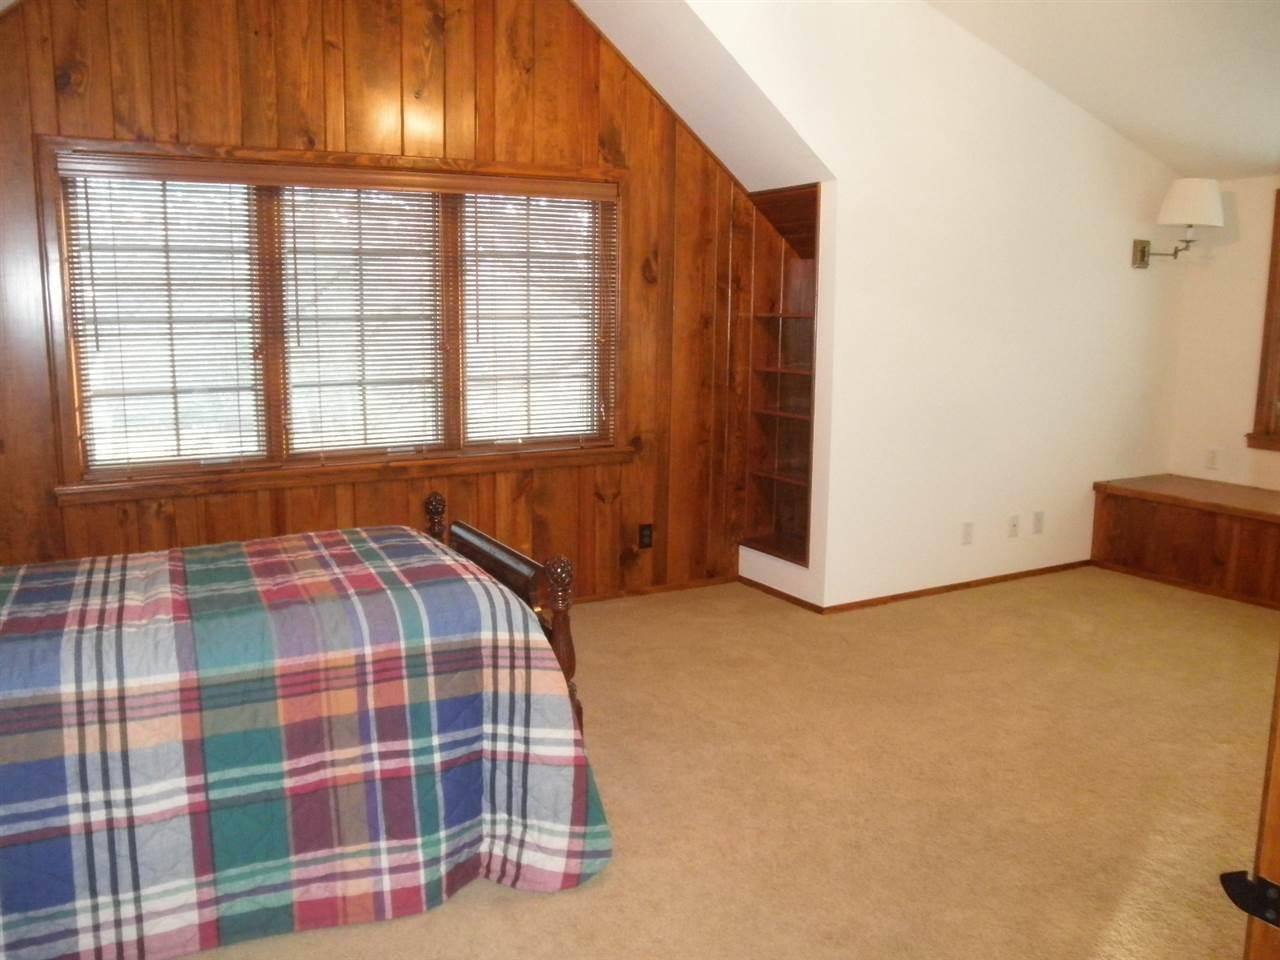 Sold Cross Sale W/ MLS | 88 Elmwood  Ponca City, OK 74601 21